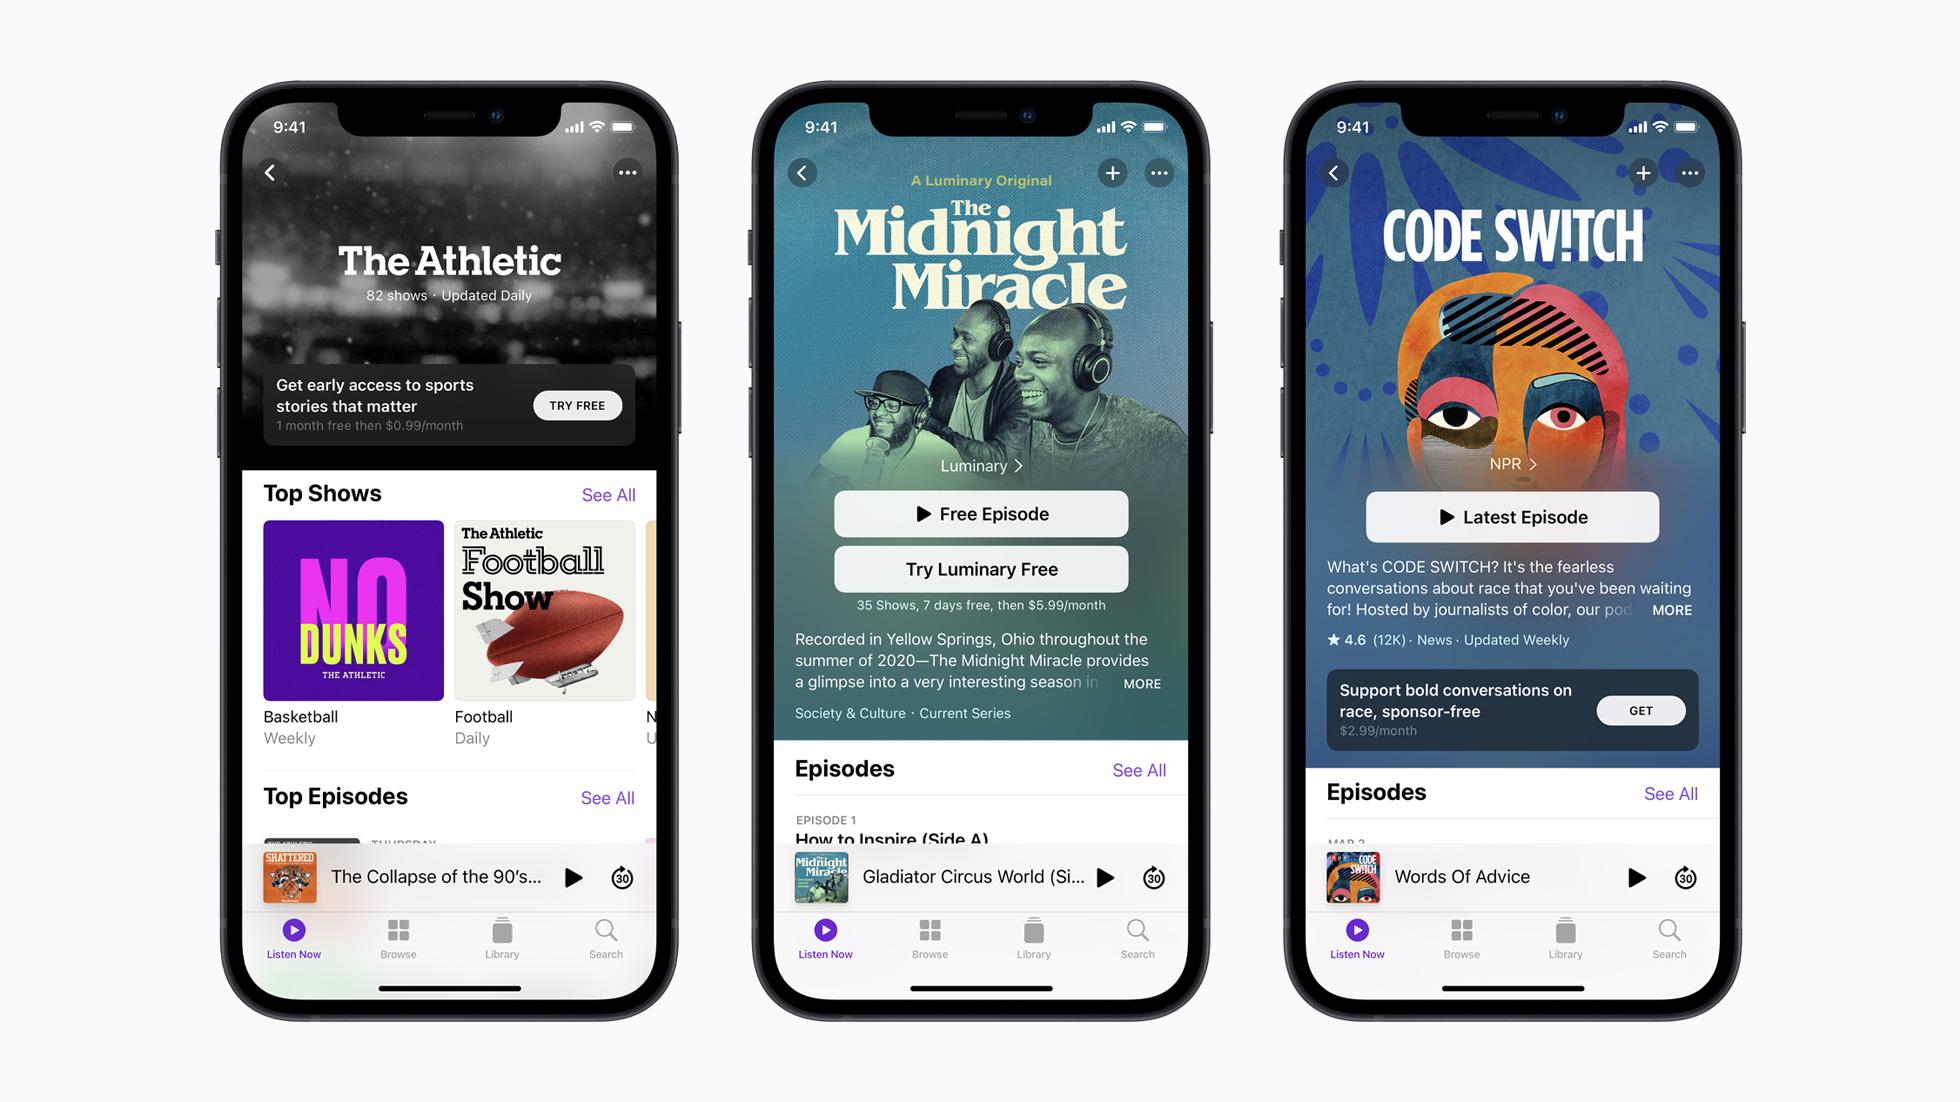 Diesmal wirklich - Apple Podcasts Subscriptions kommt